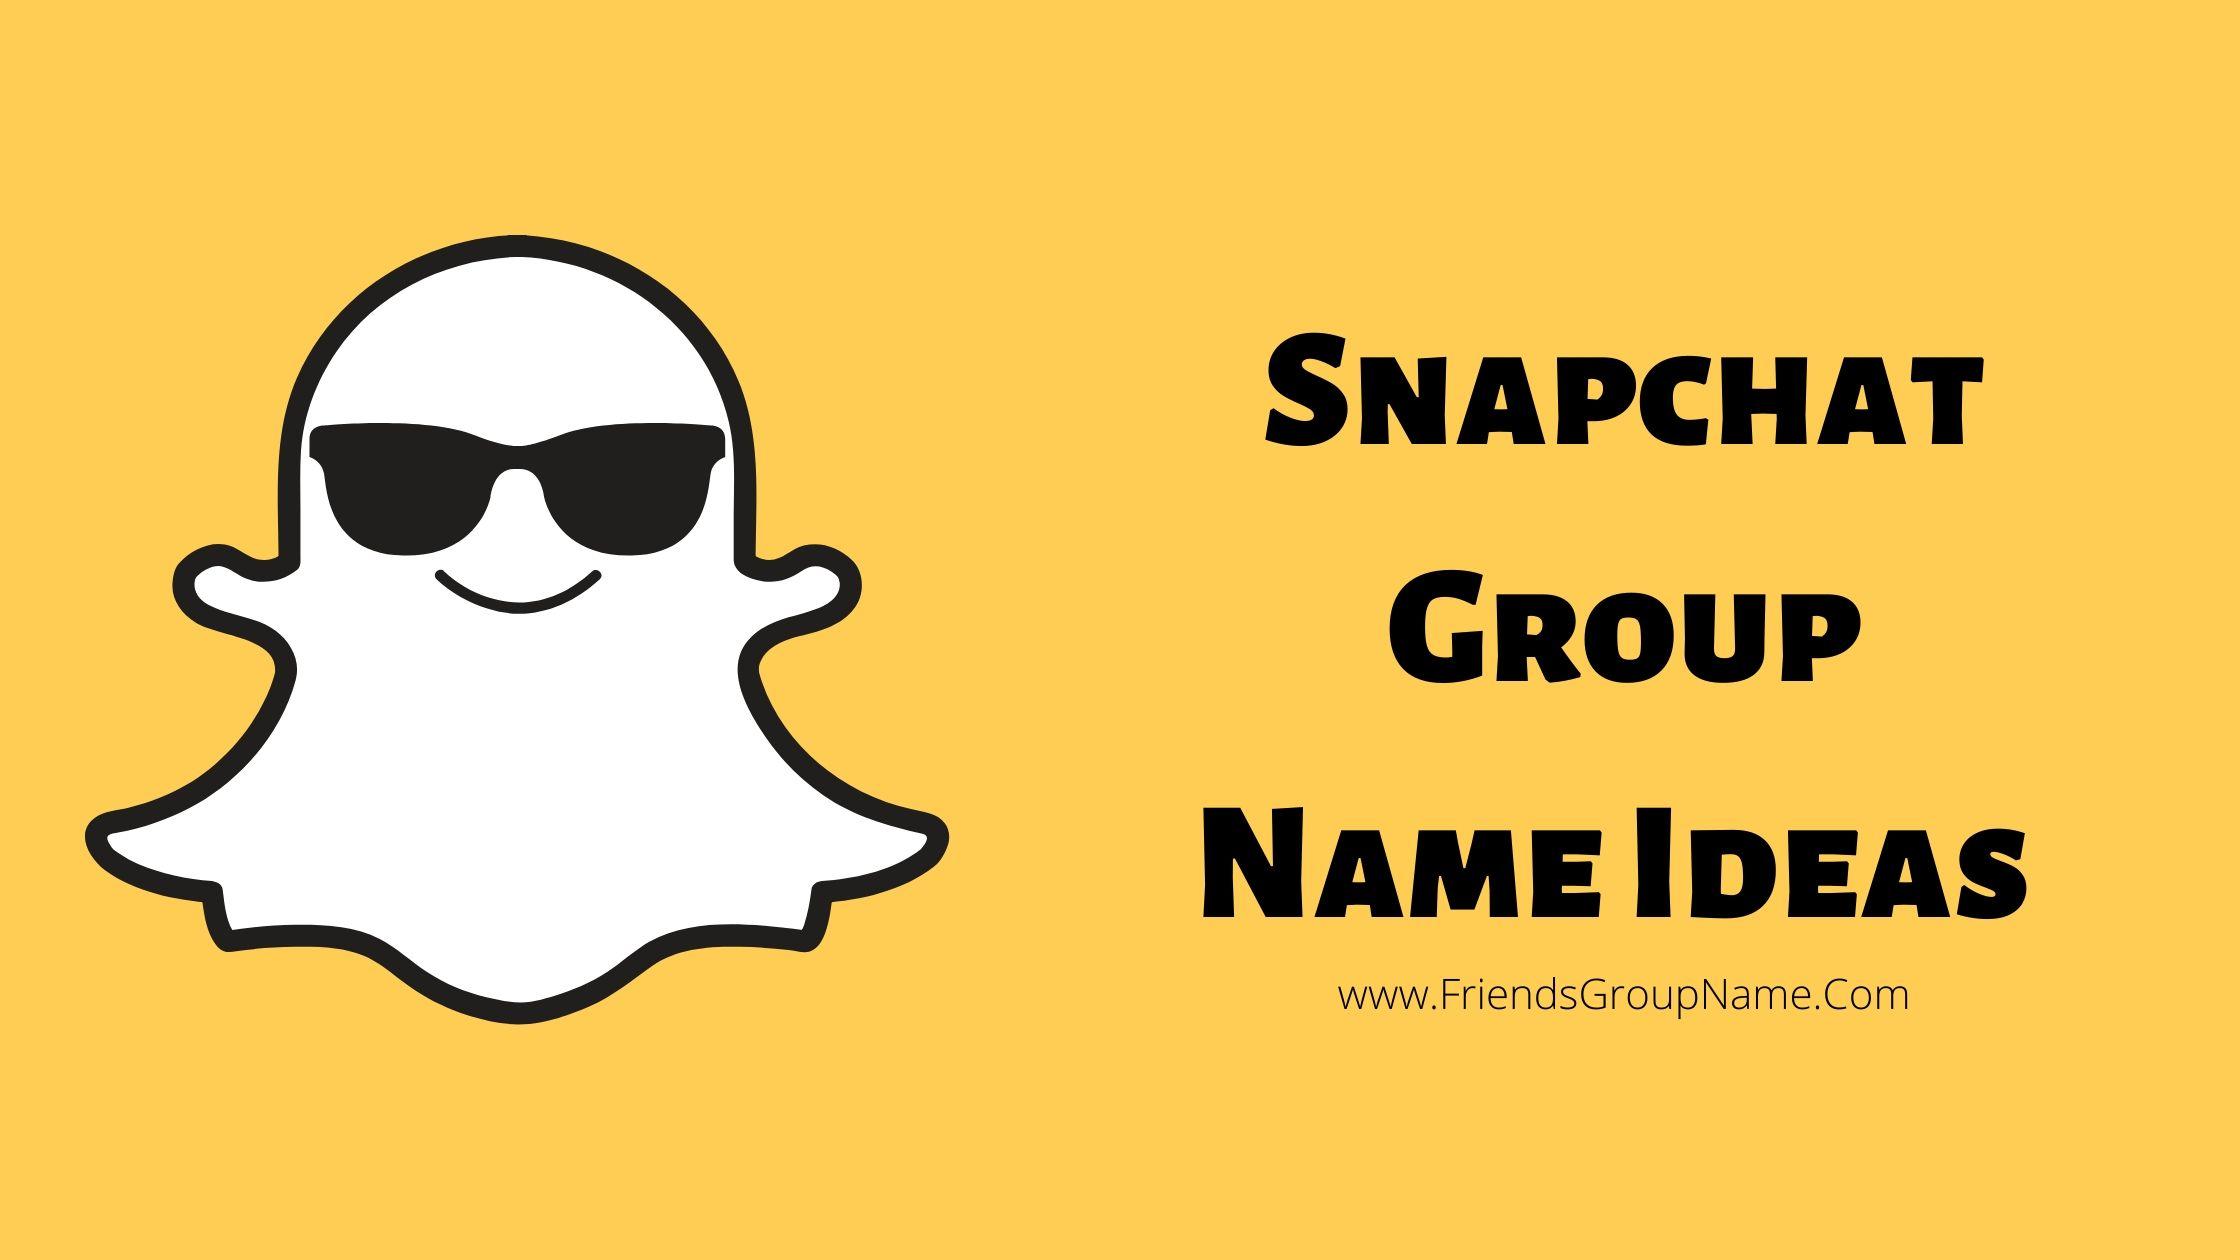 Snapchat Group Name Ideas